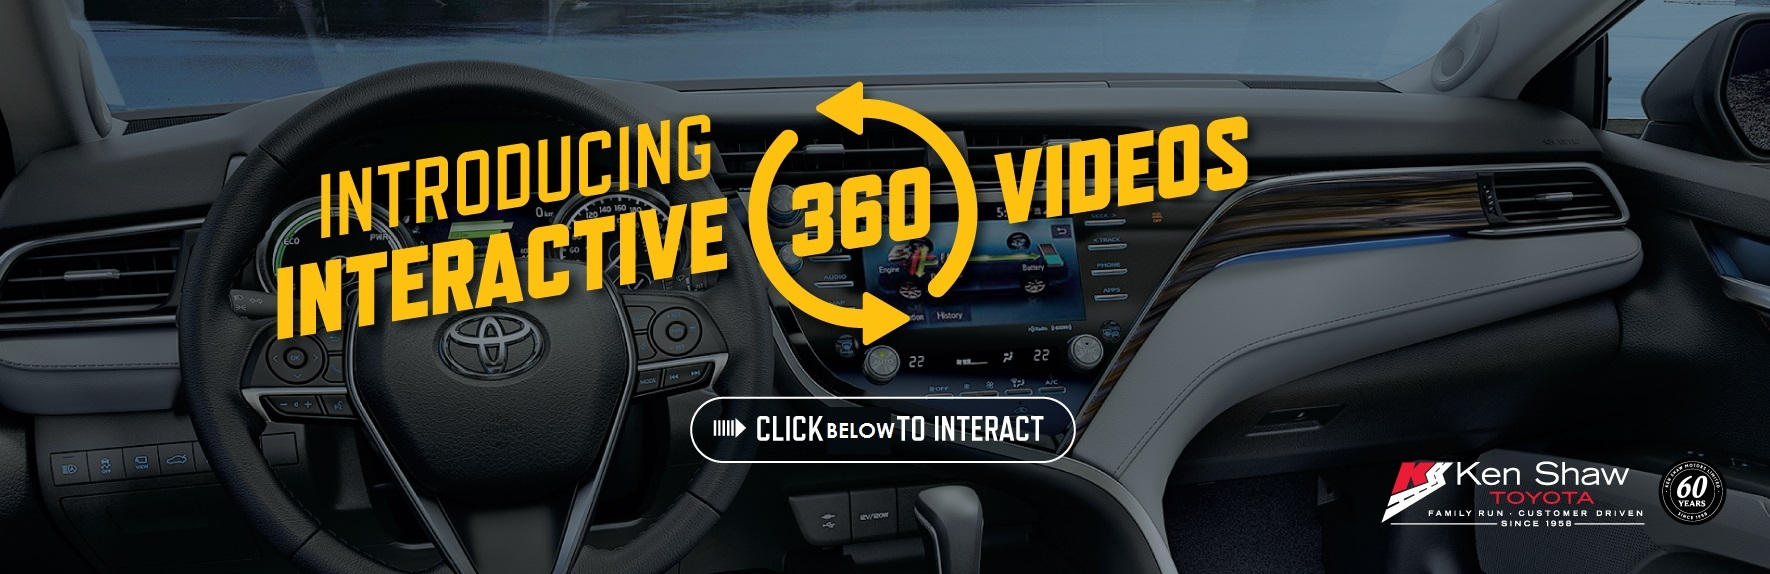 KST-360-Video-Web-Banner-2018-below